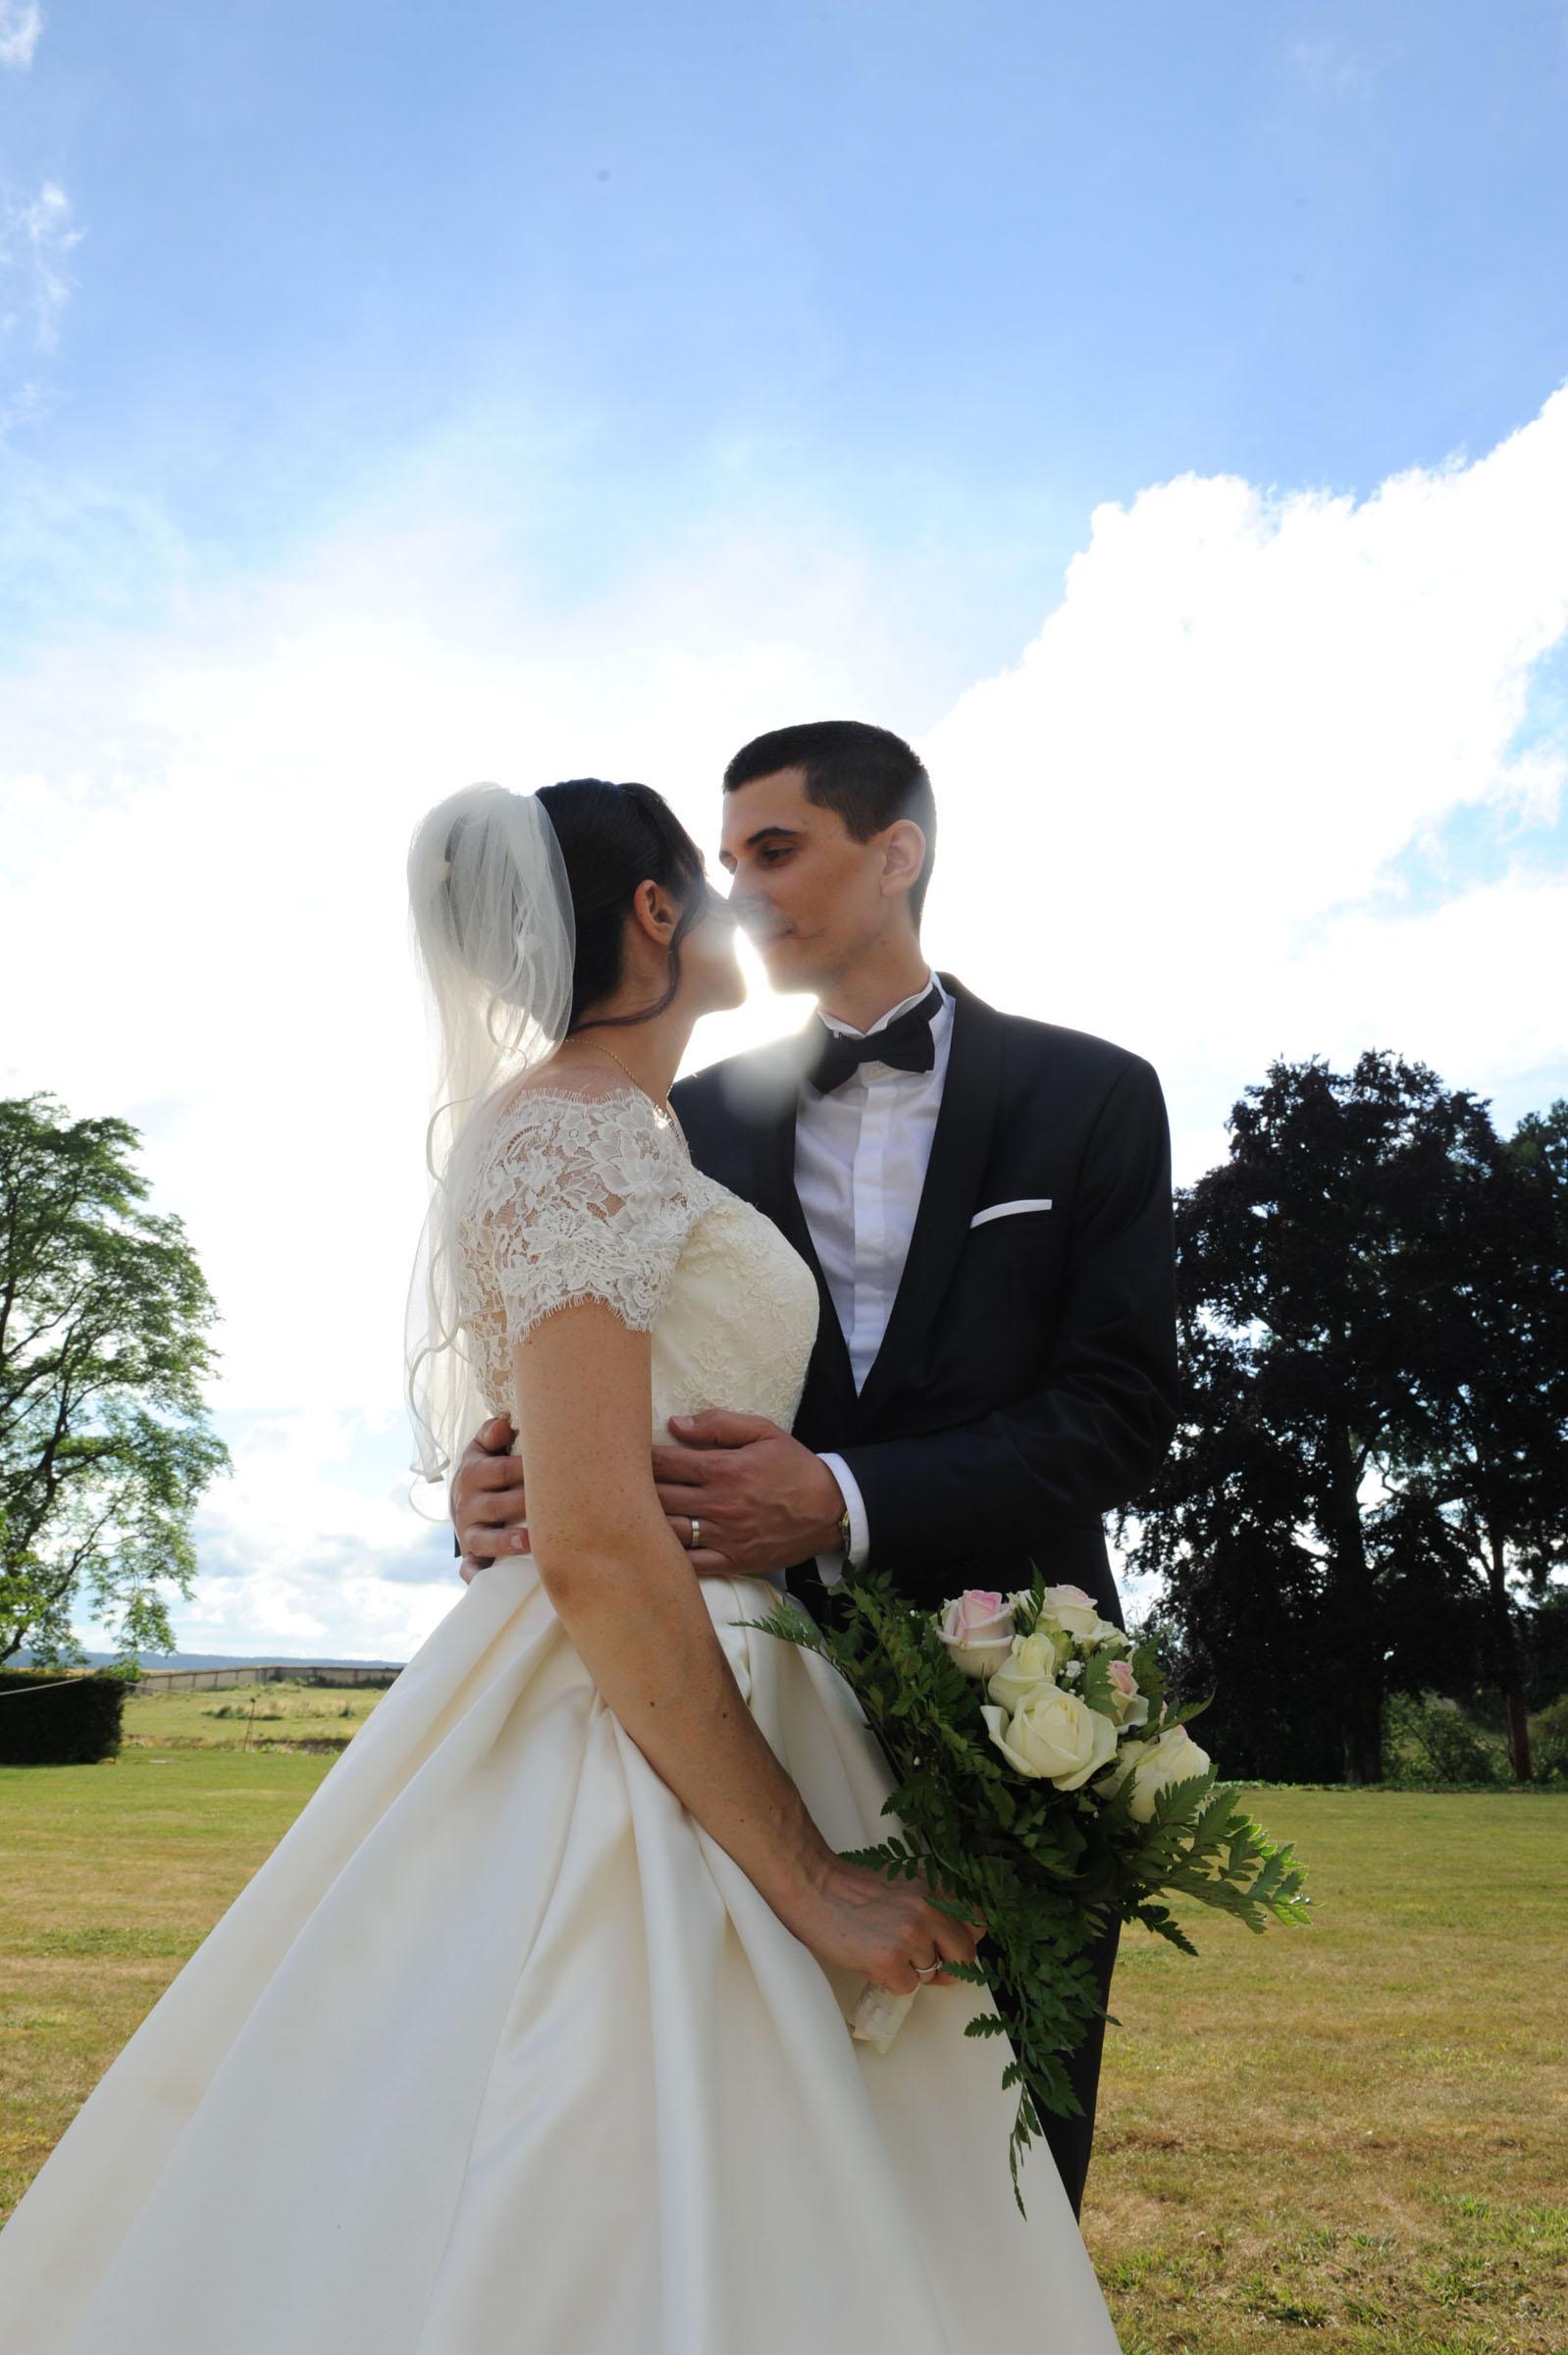 Mariage par Imag'in Photographie